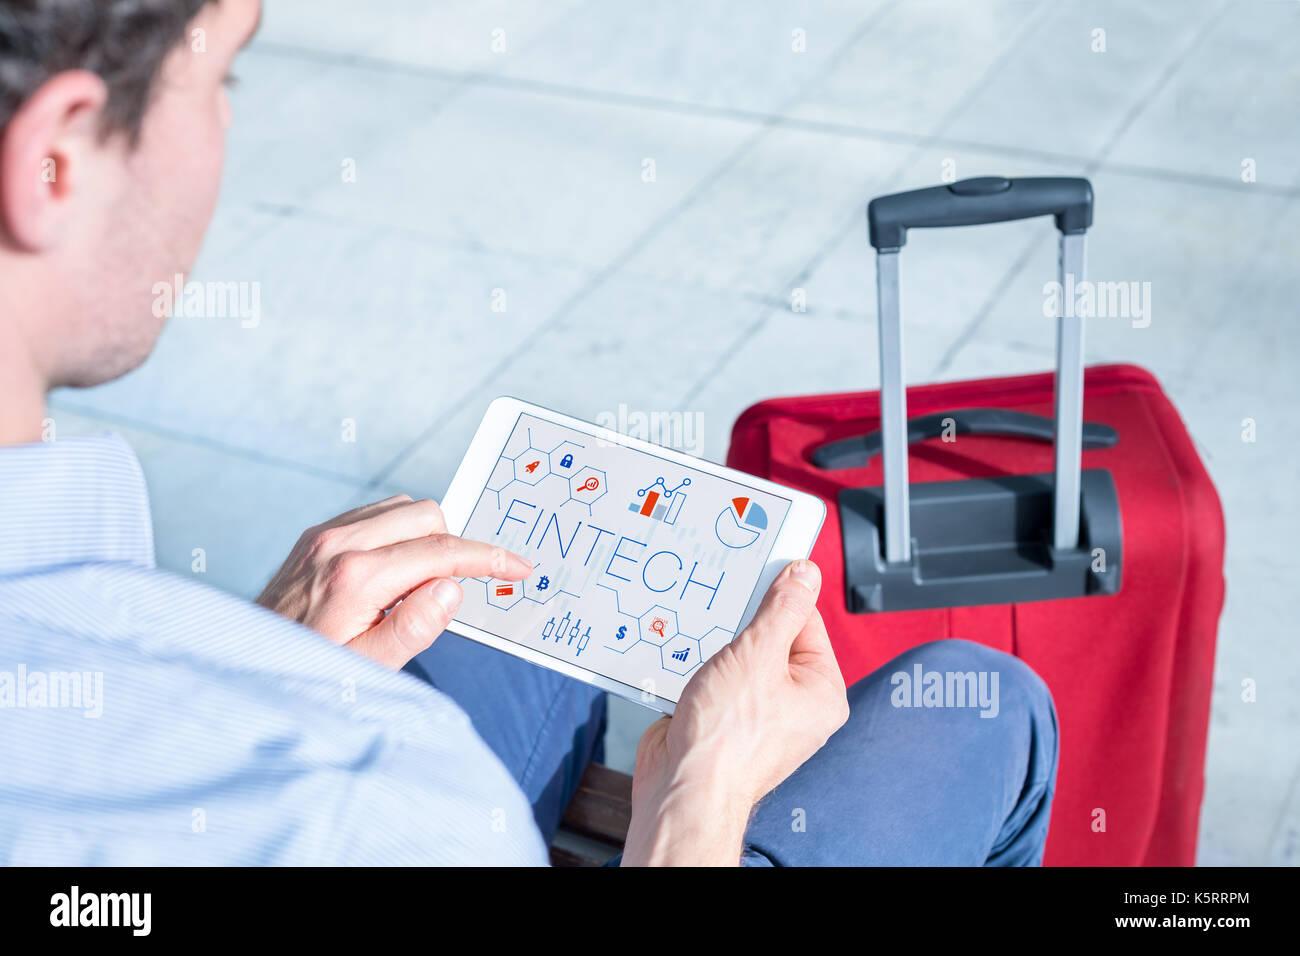 Geschäftsmann am Flughafen mit digitalen Tablet Computer mit infografik Konzept der fintech (Financial Technology) auf dem Bildschirm, Business Travel Stockbild